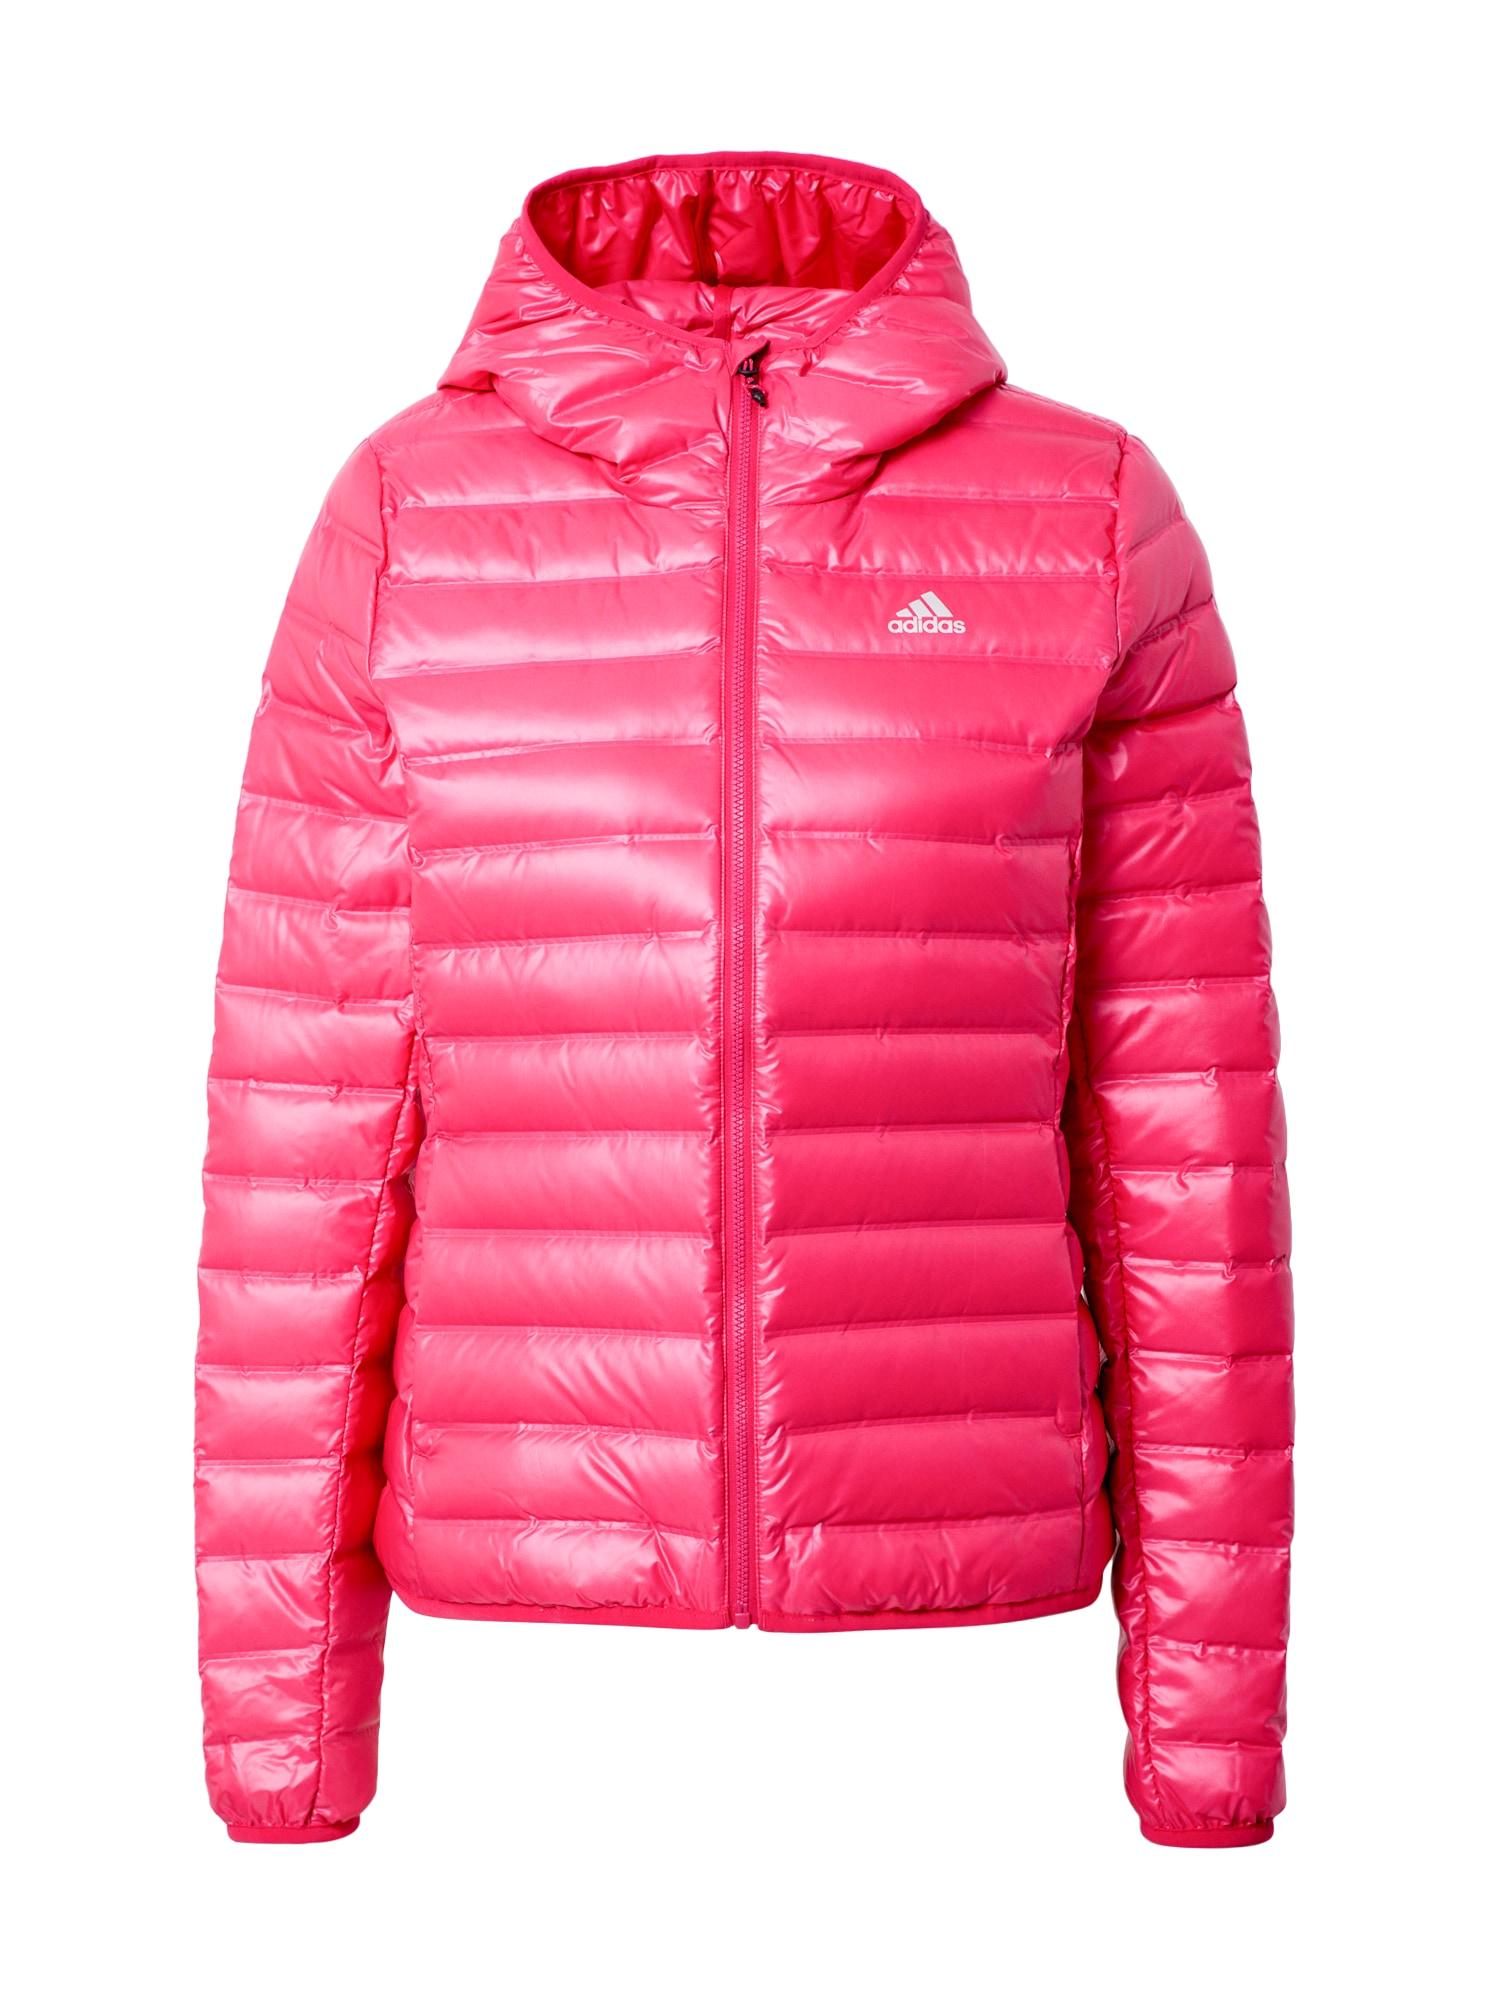 ADIDAS PERFORMANCE Outdoorová bunda 'Varilite'  pink